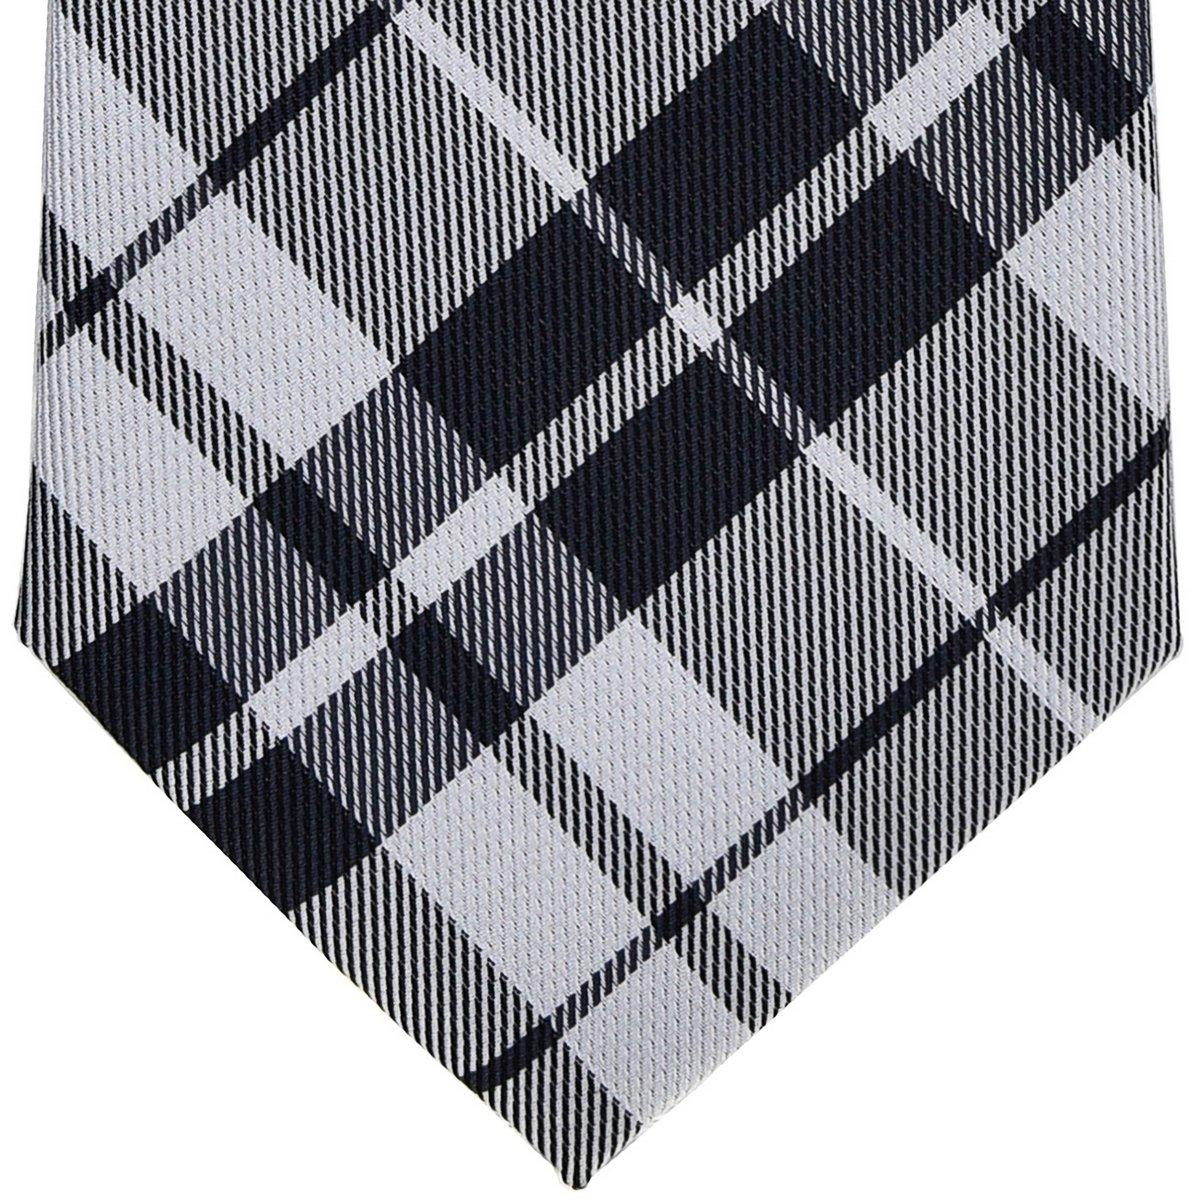 Retreez Preppy Plaid Check Woven Boys Tie Various Colors 8-10 years